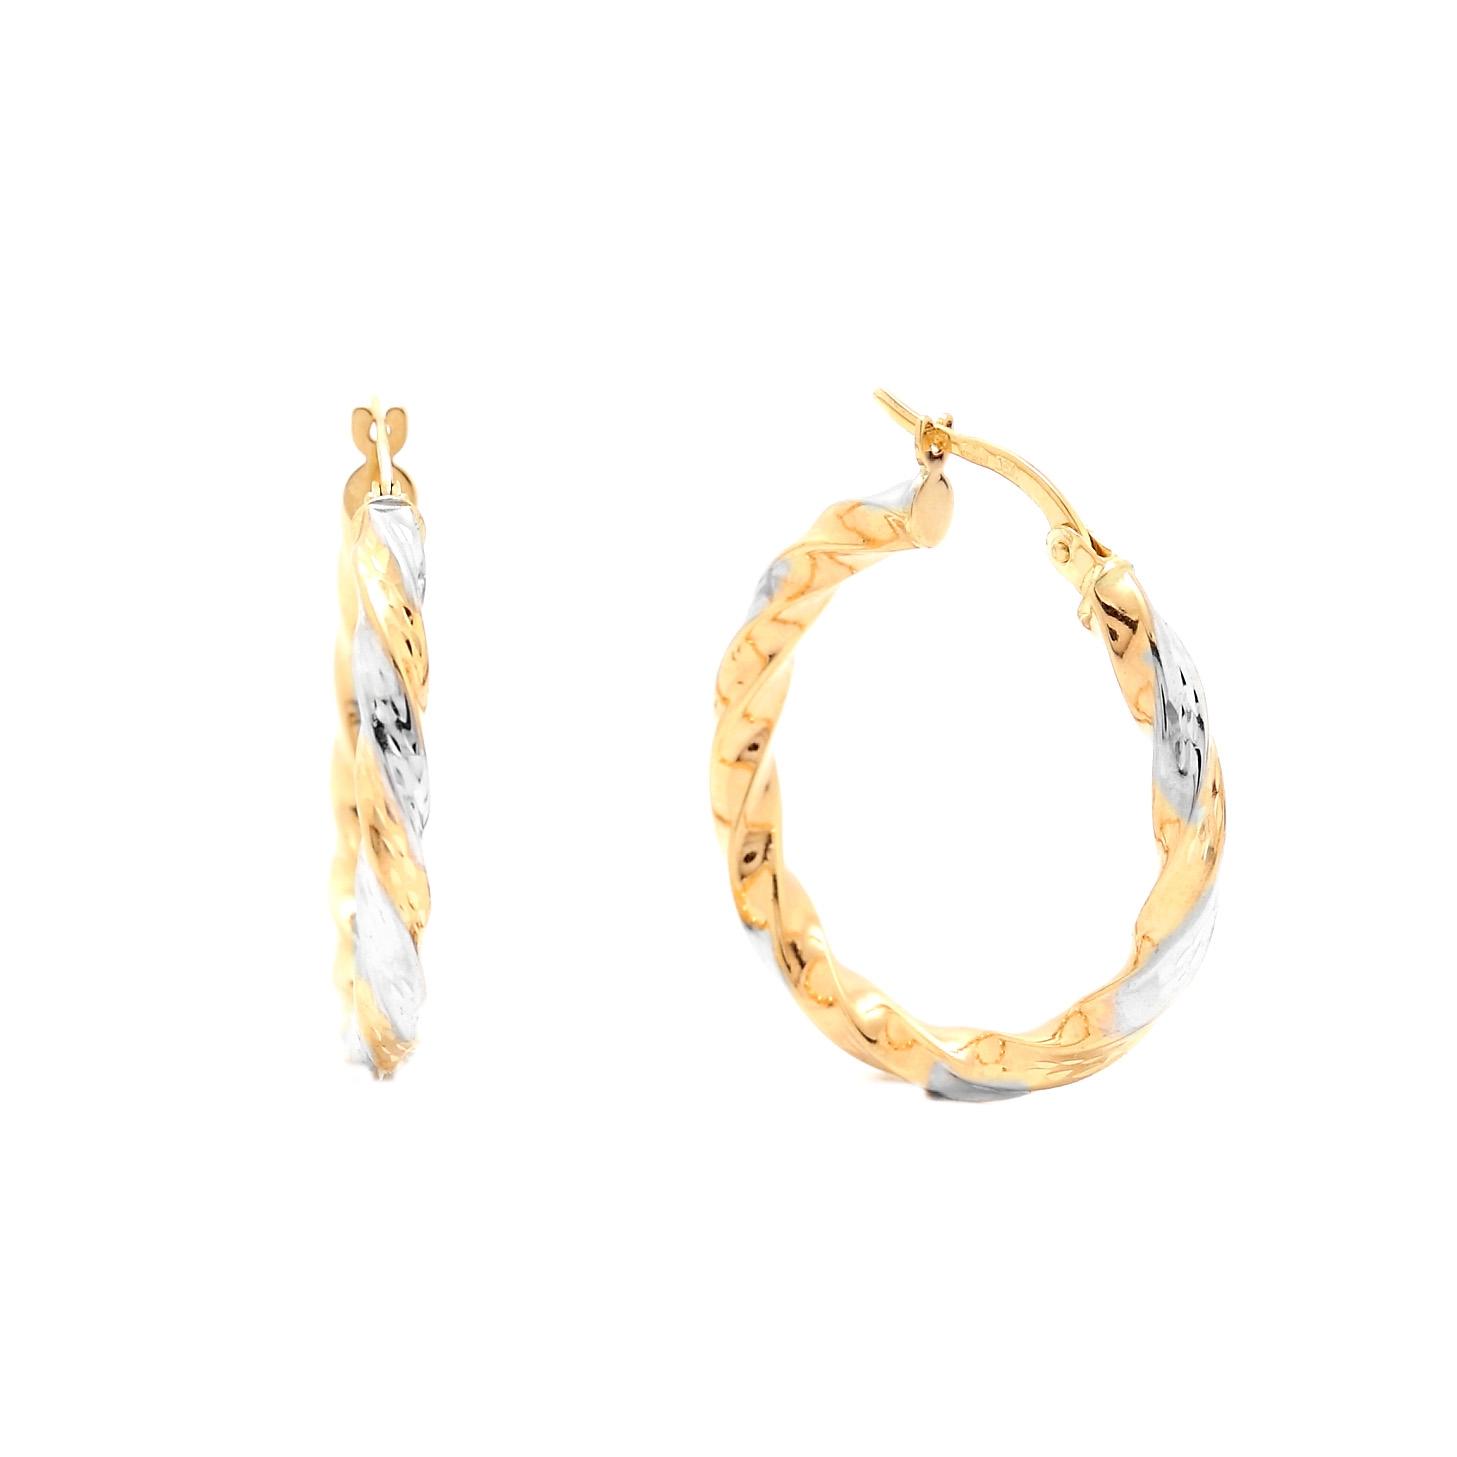 Zlaté náušnice ESTEE - kruhy